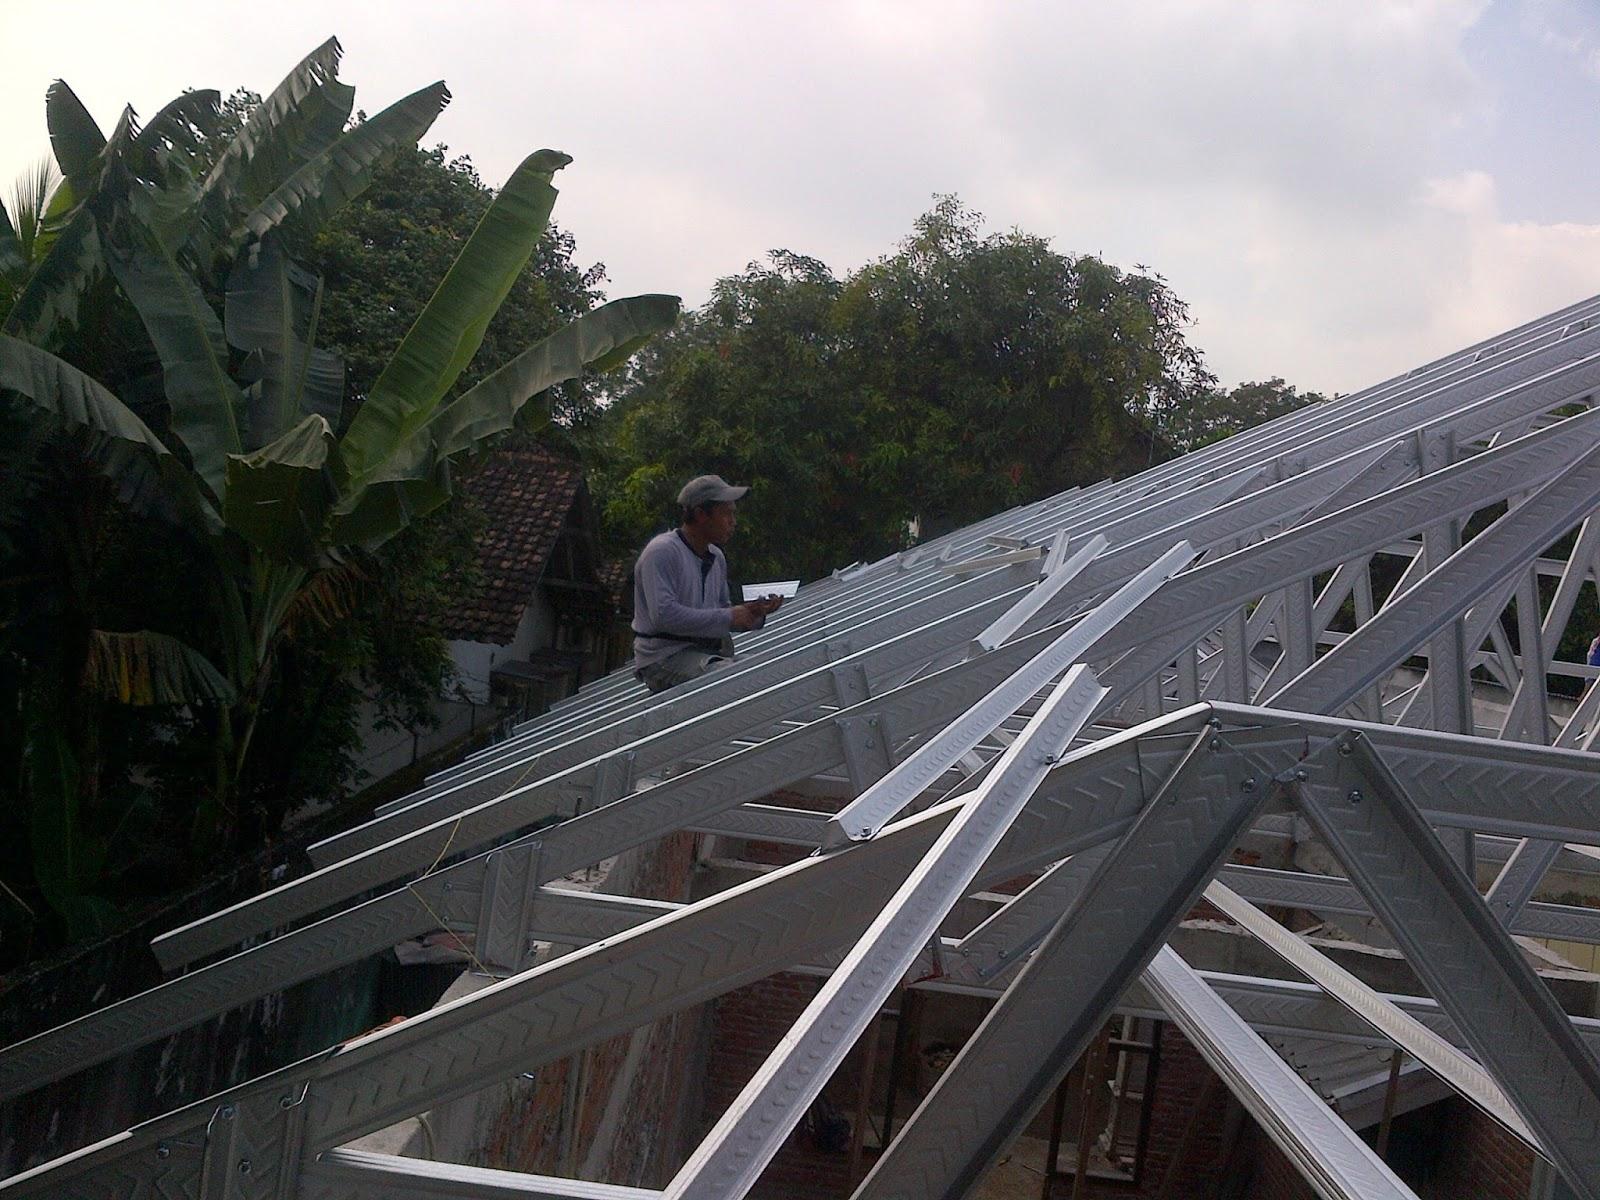 baja ringan kencana kediri tukang bangun rumah borong bangunan renovasi ruko